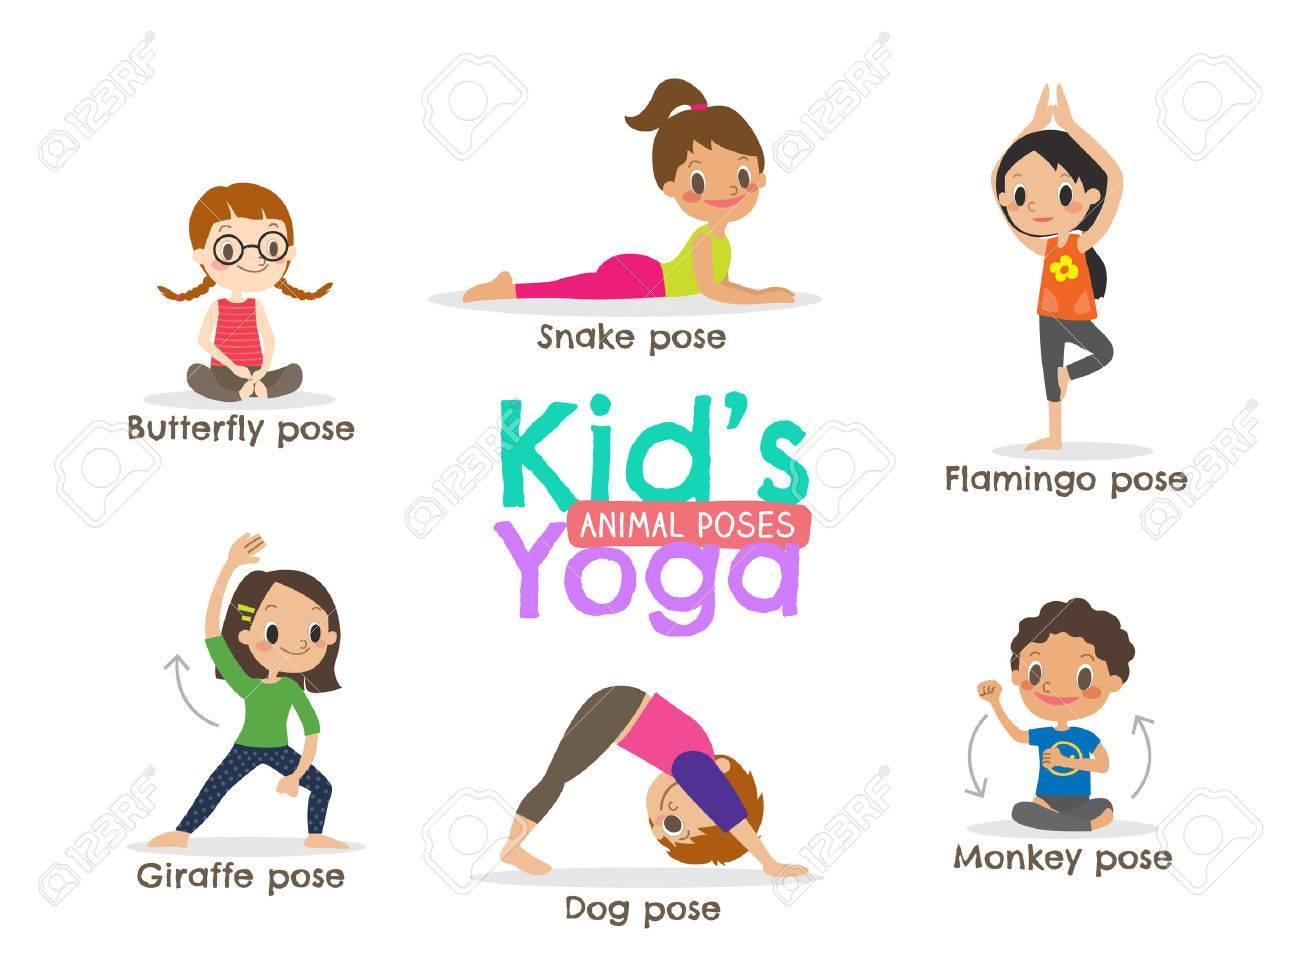 Yoga Kids Poses Cartoon Illustration Royalty Free Cliparts Vectors